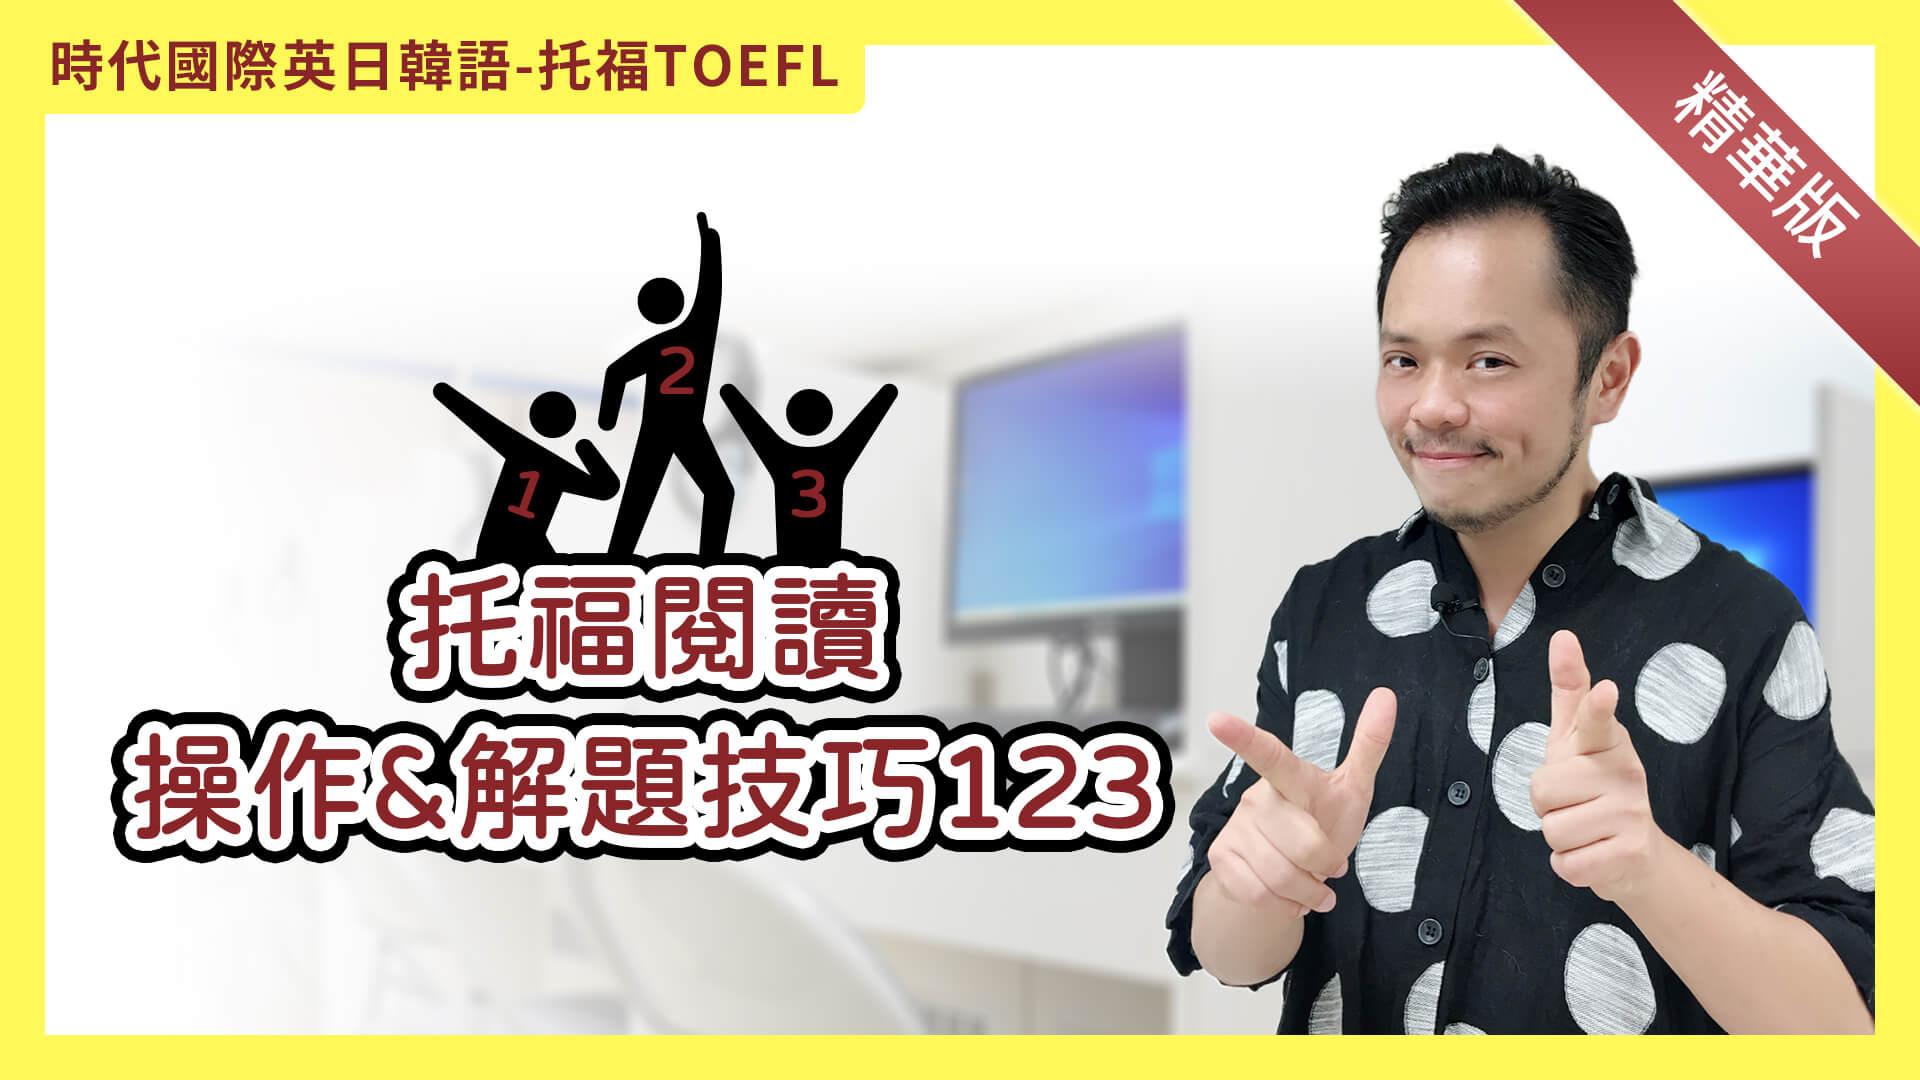 TOEFL,托福考試   時代國際雅思補習班